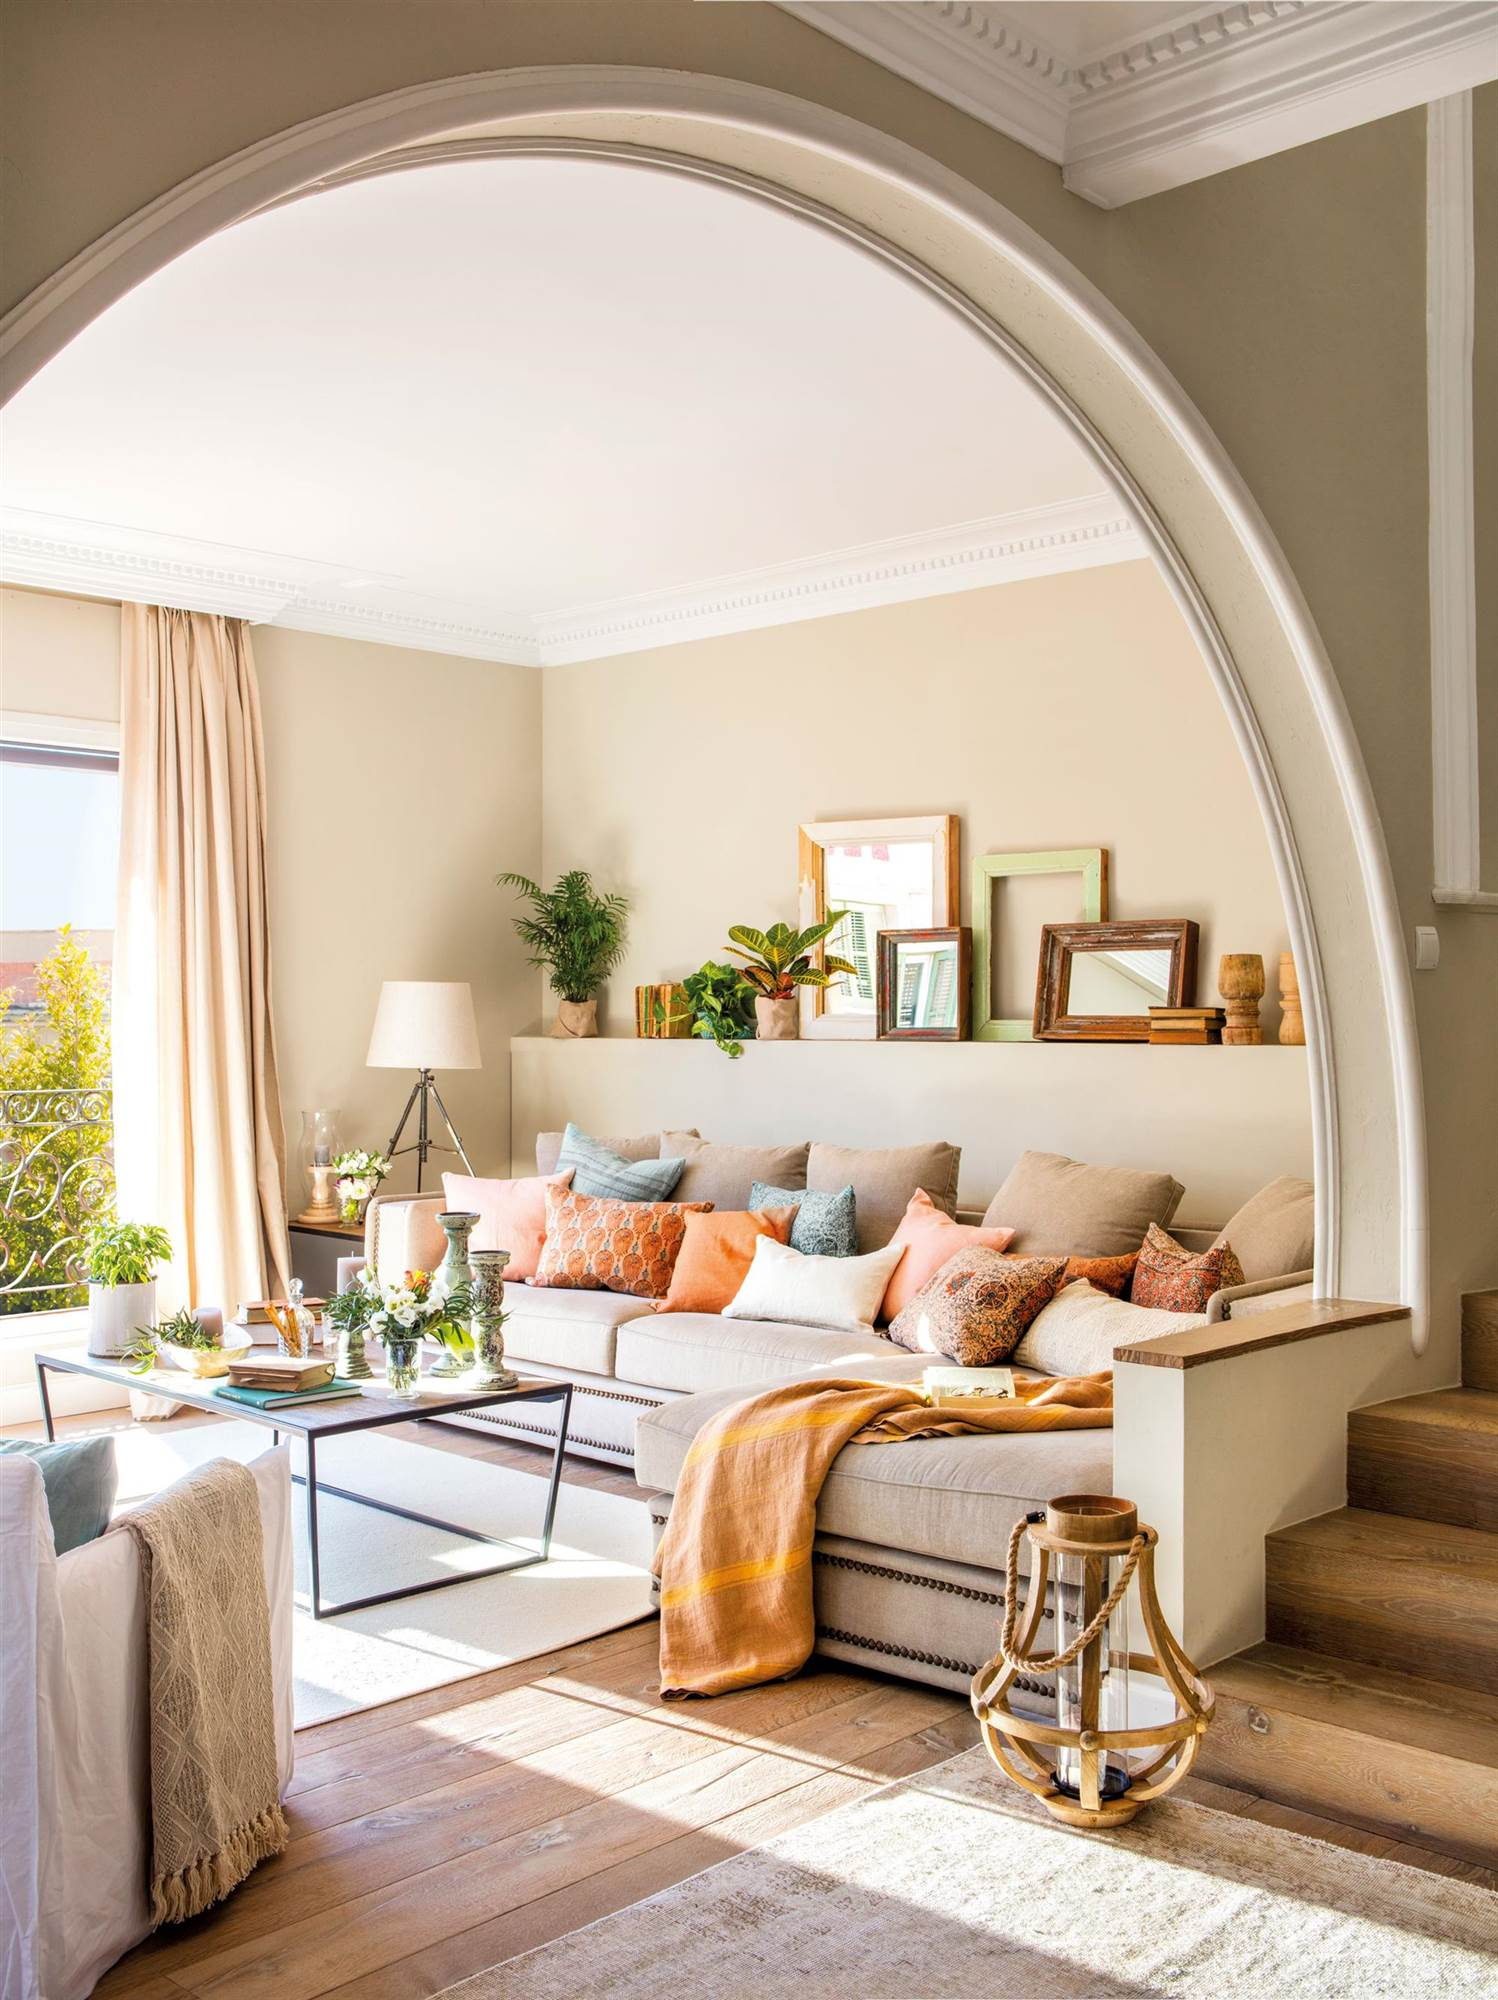 salon con pared pintada de beige_VIRGO-BEIGE-00458606